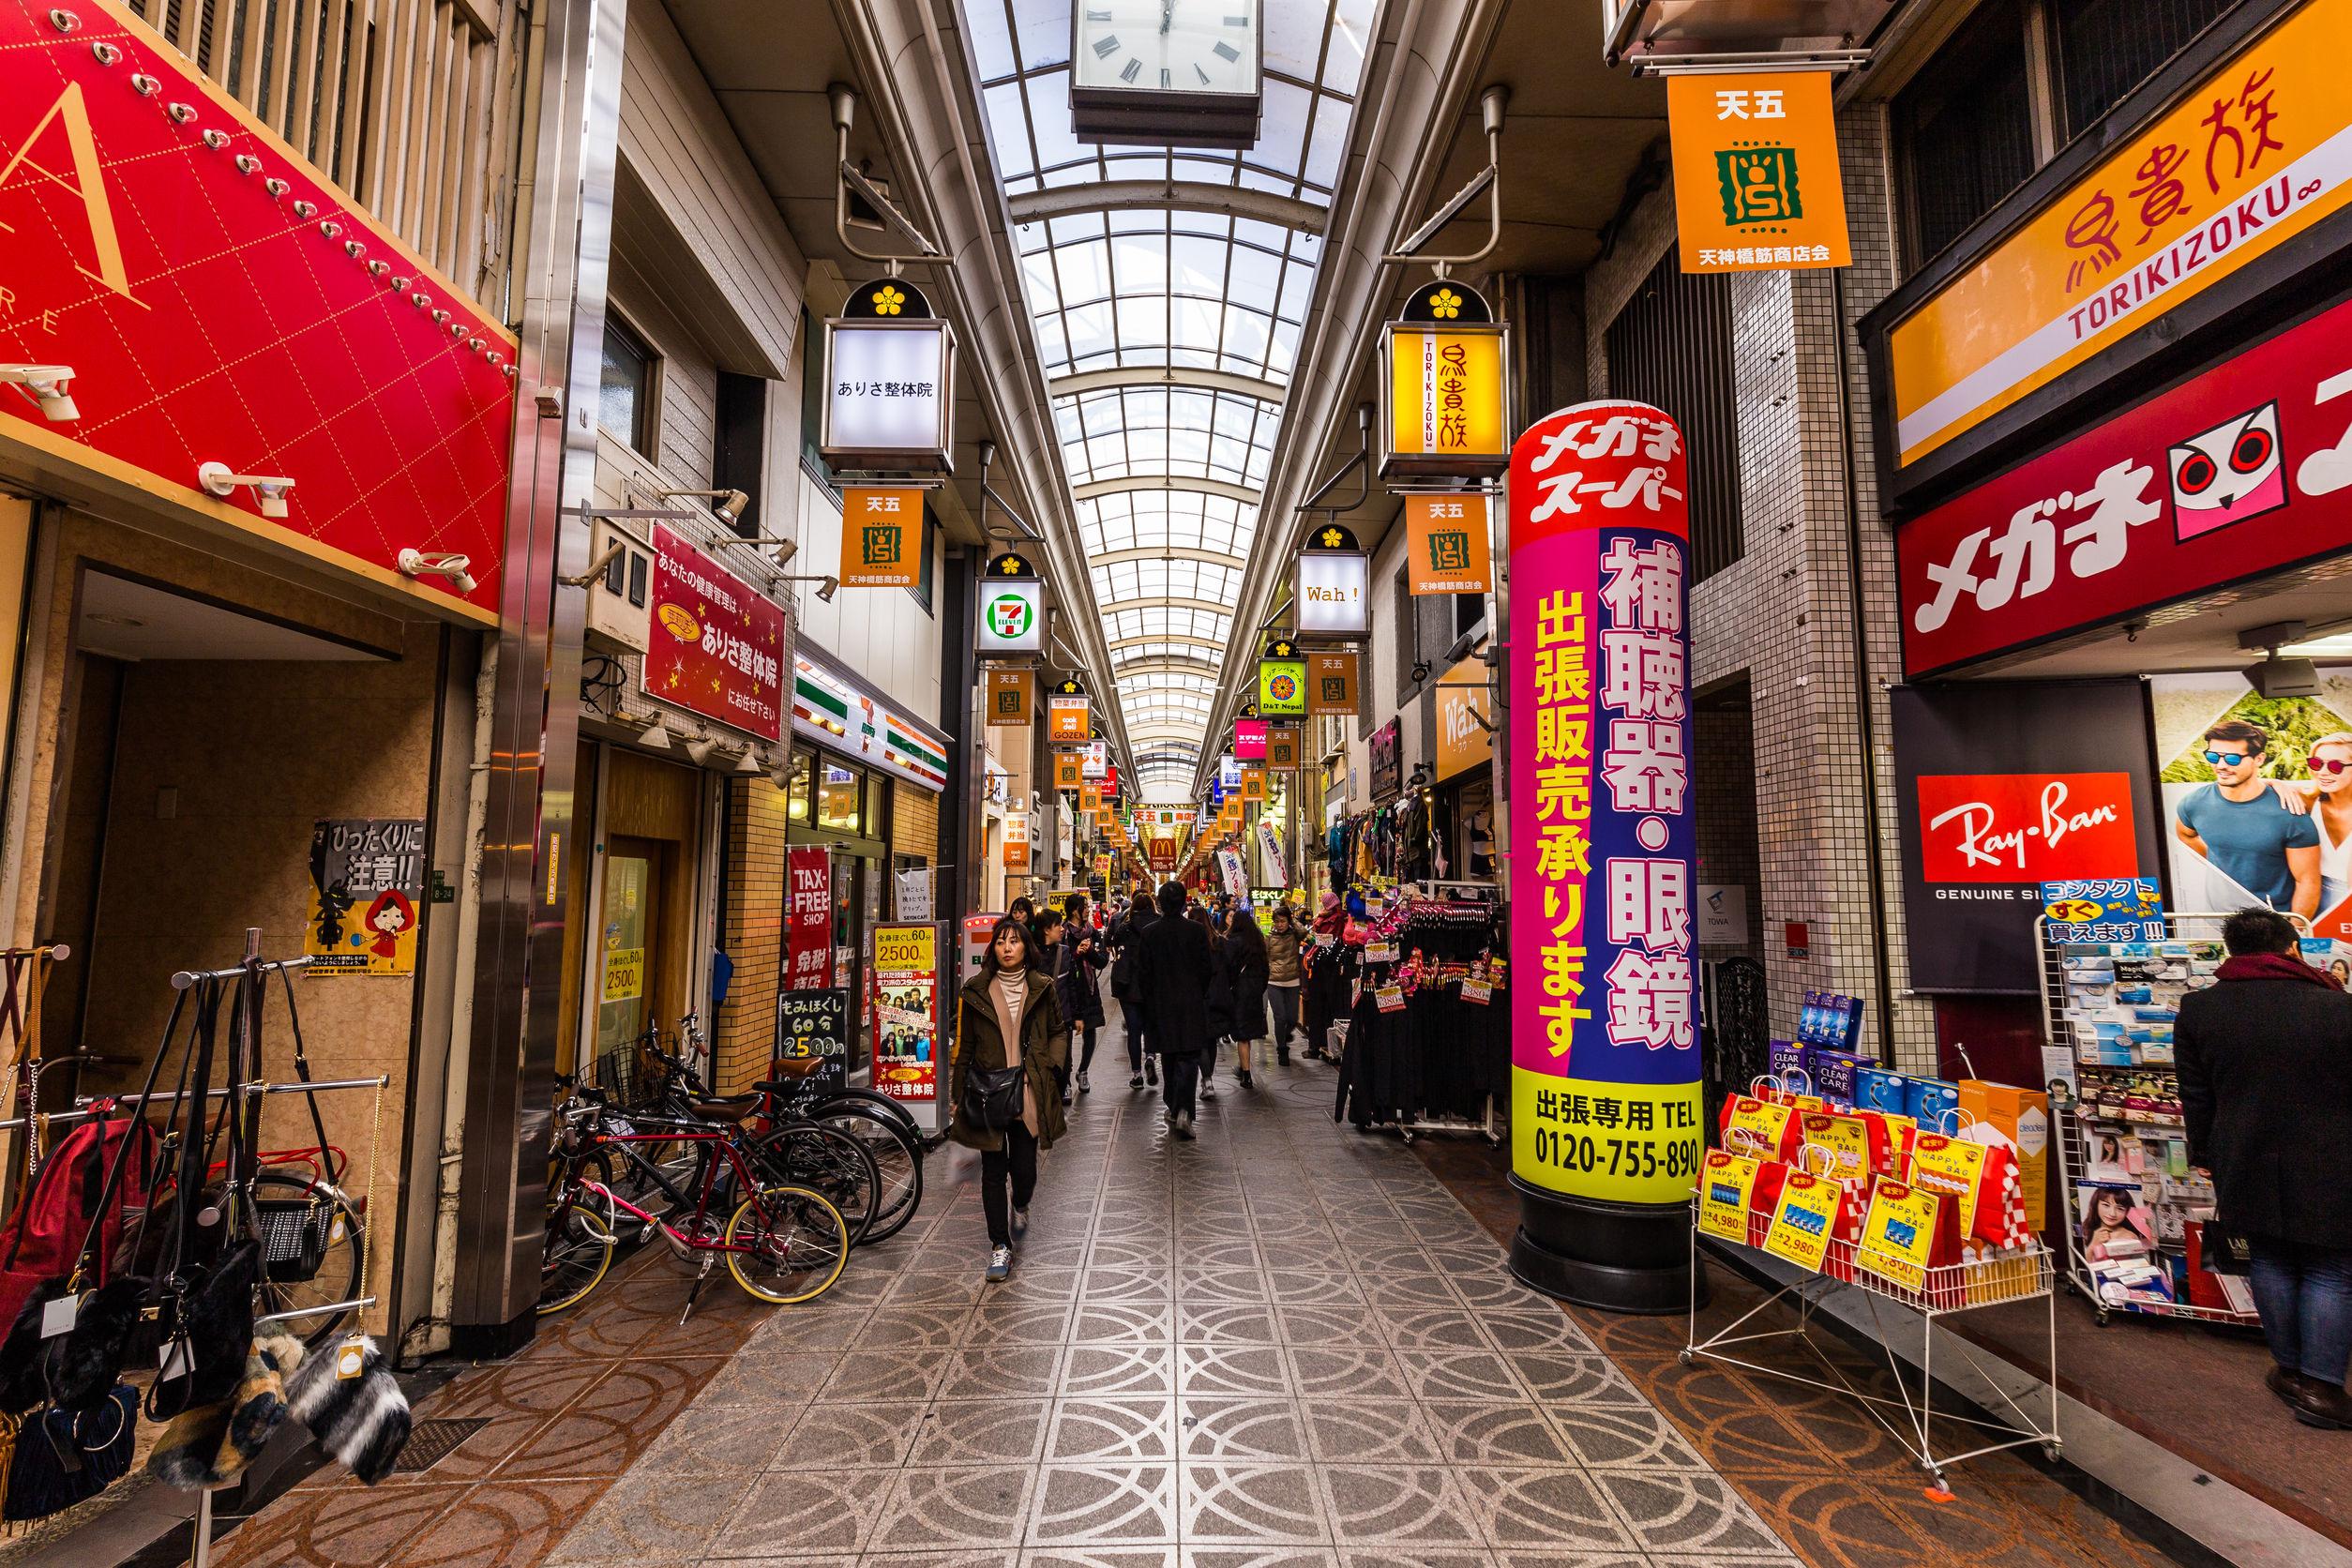 Tenjinbashisuji Shopping Street the longest straight shopping street in Osaka Japan